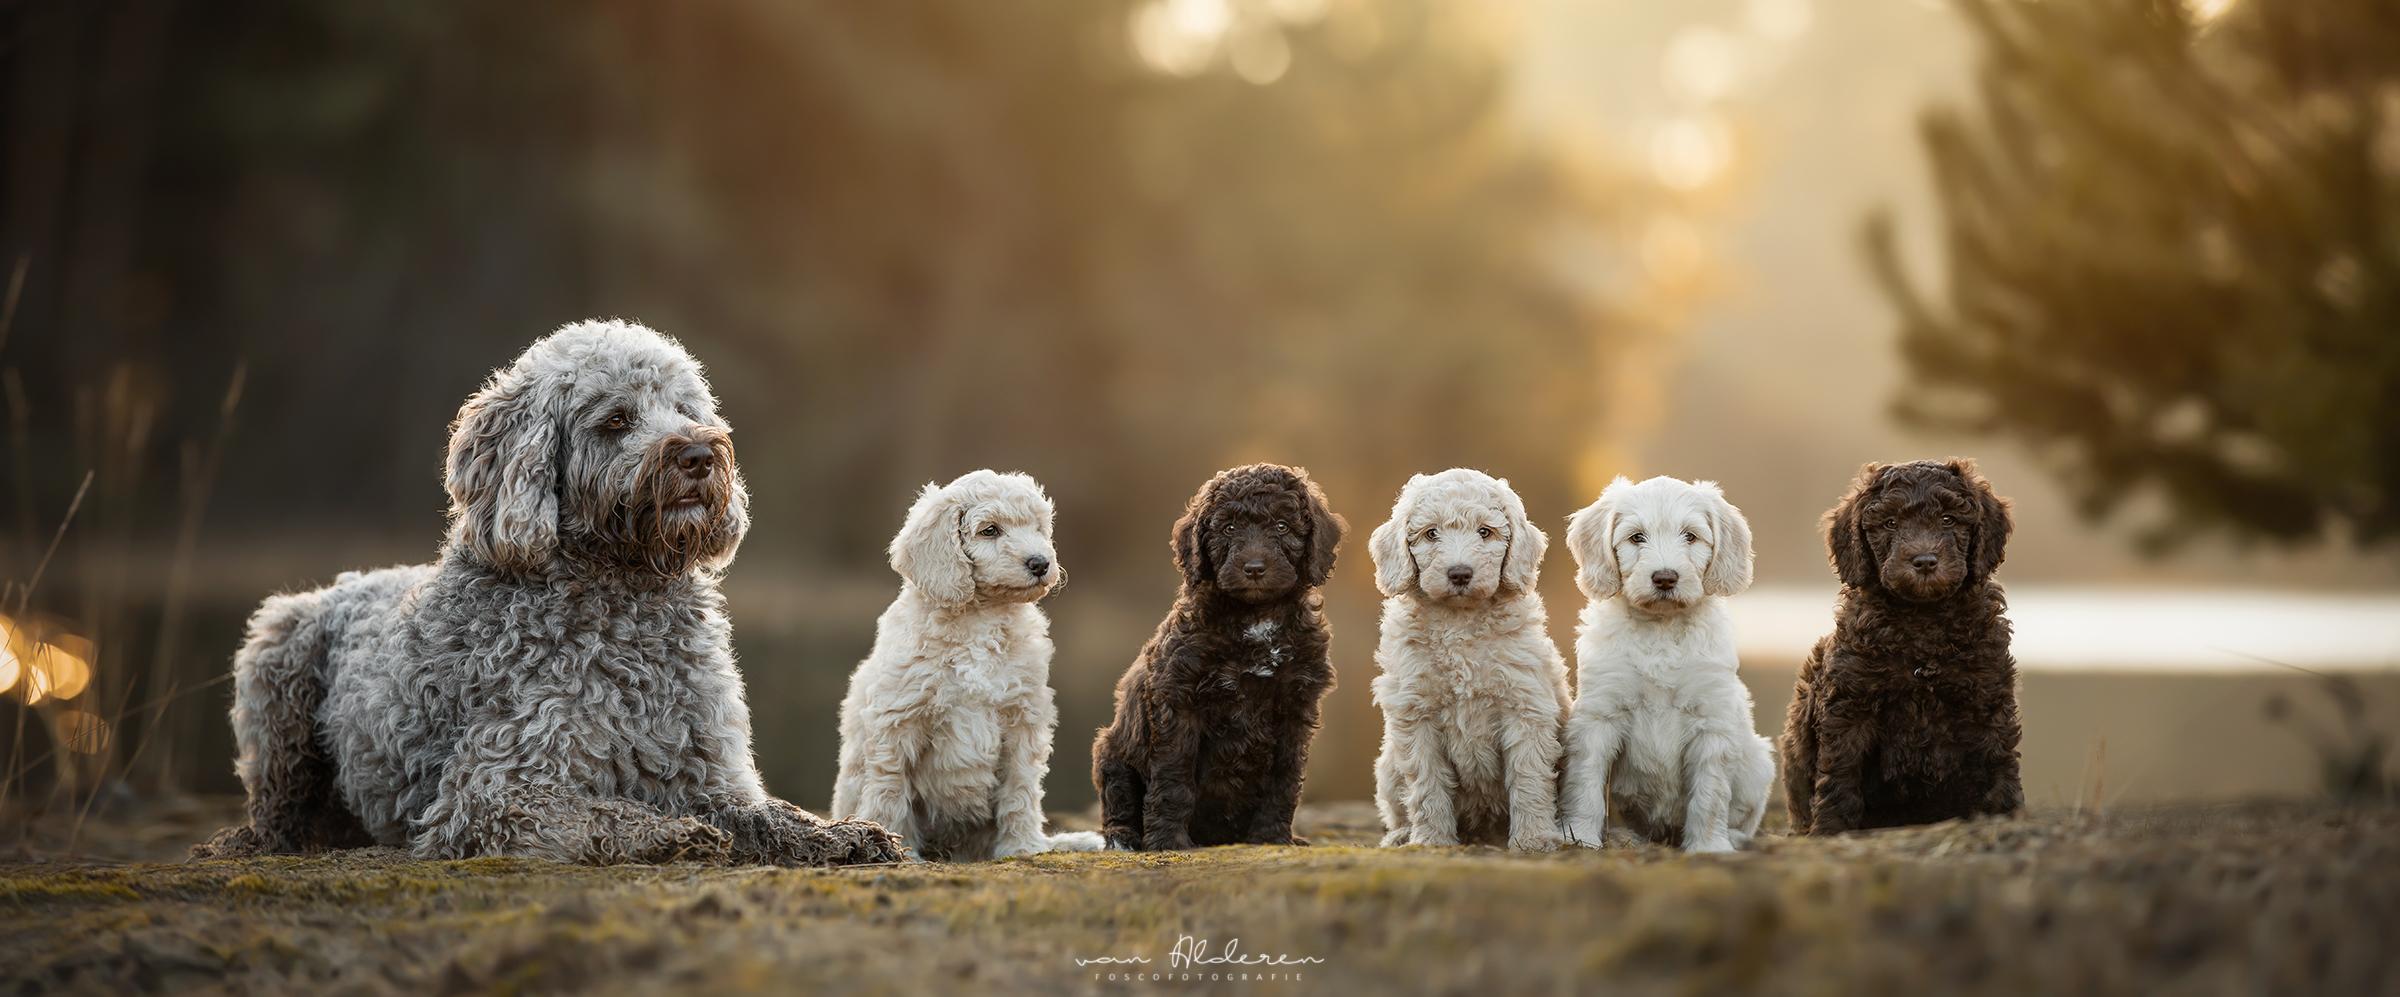 Labradoodle puppy's nestje hondenfotografie